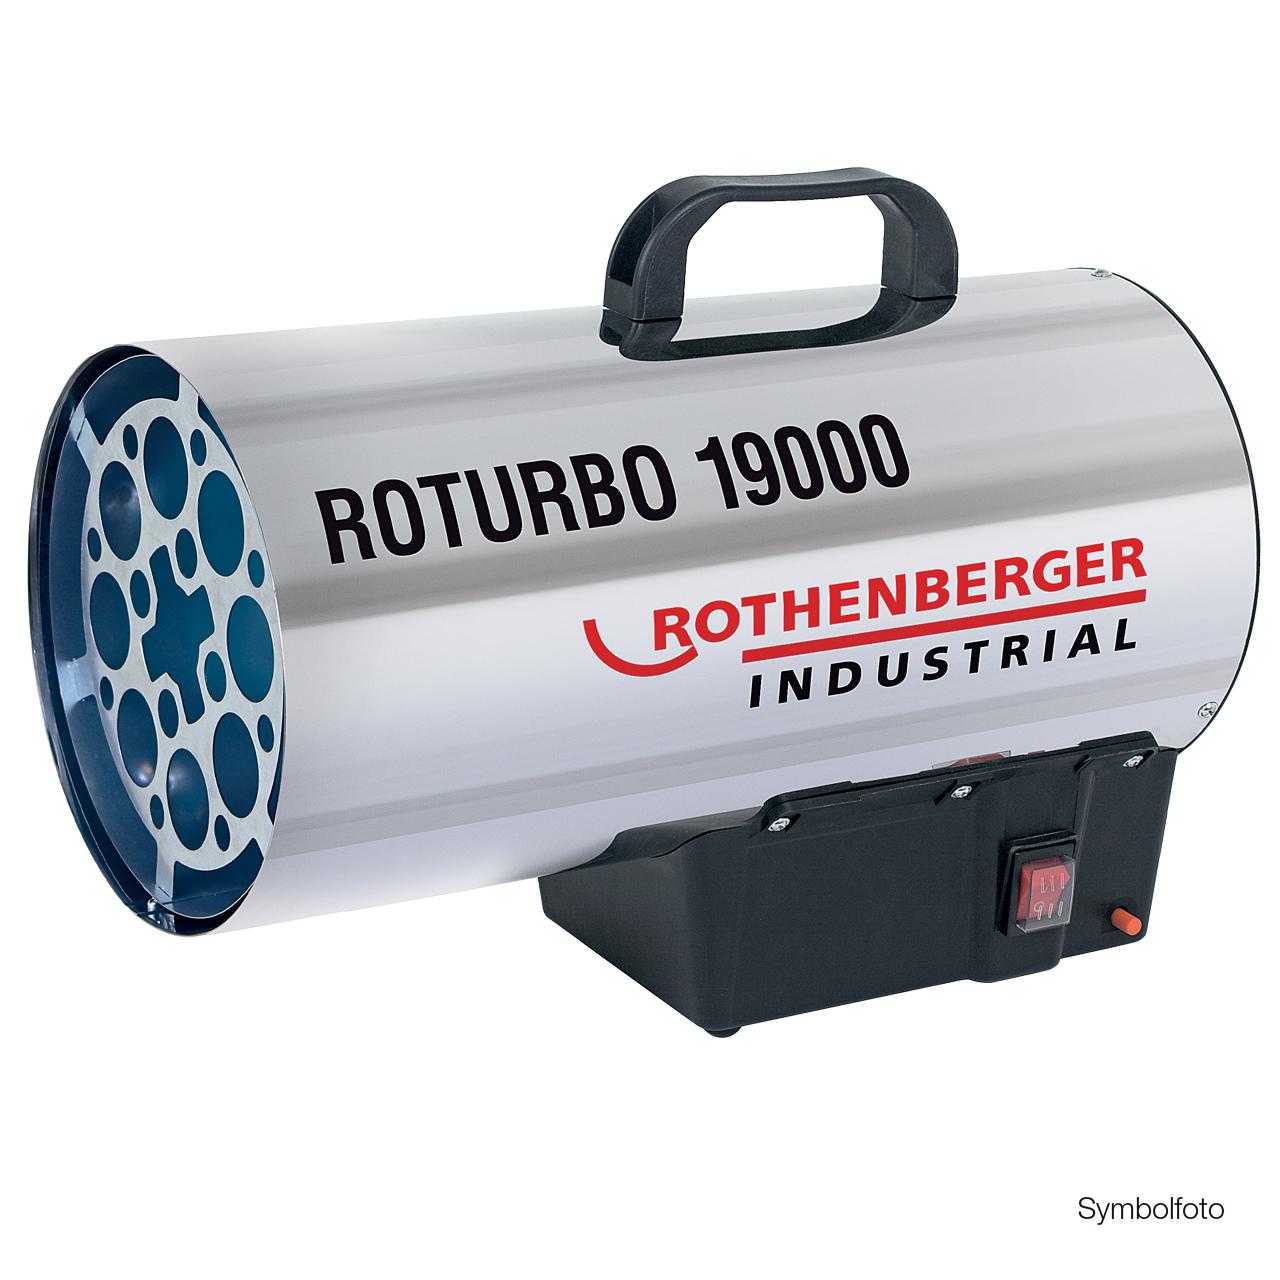 B-Ware Rothenberger Industrial Gasheizkanone Roturbo 19000 Heizgerät